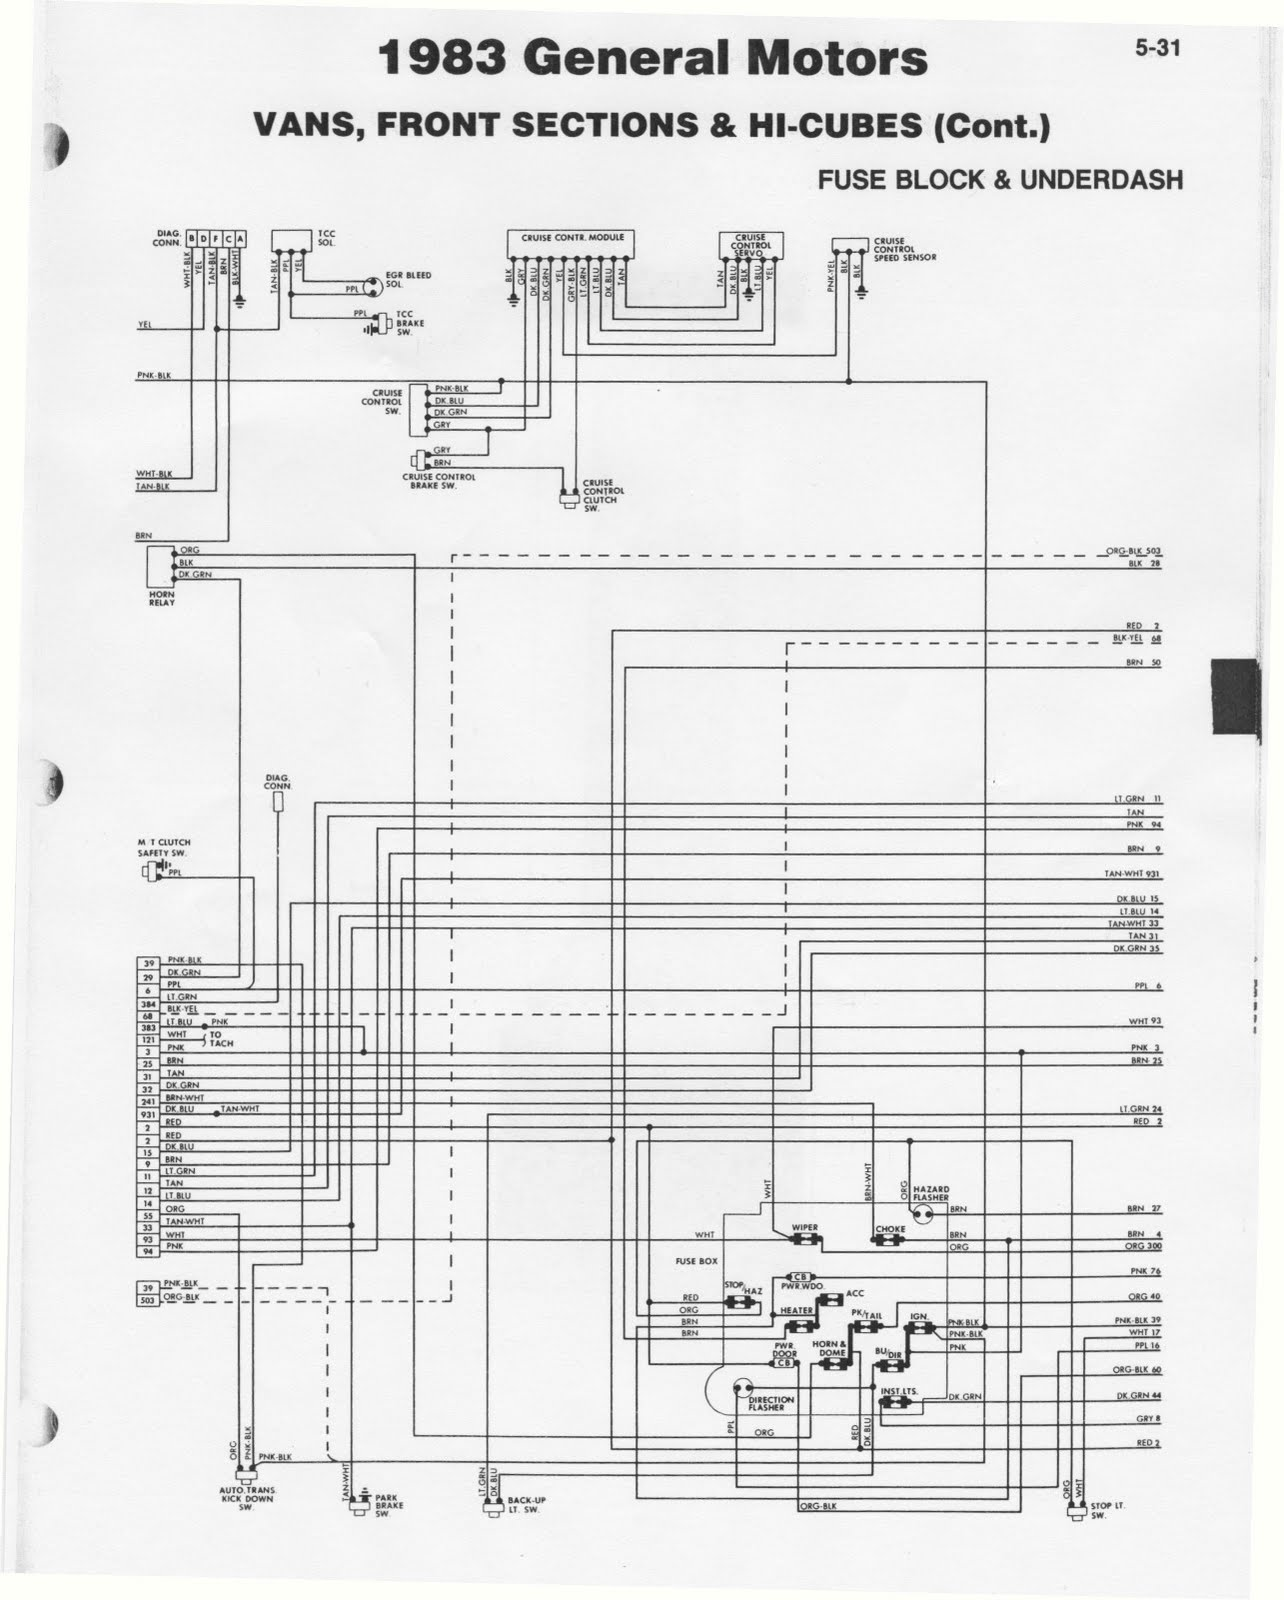 2016 Winnebago View Wiring Diagram Universal Ignition Switch 1978 Itasca Motorhome Free Engine